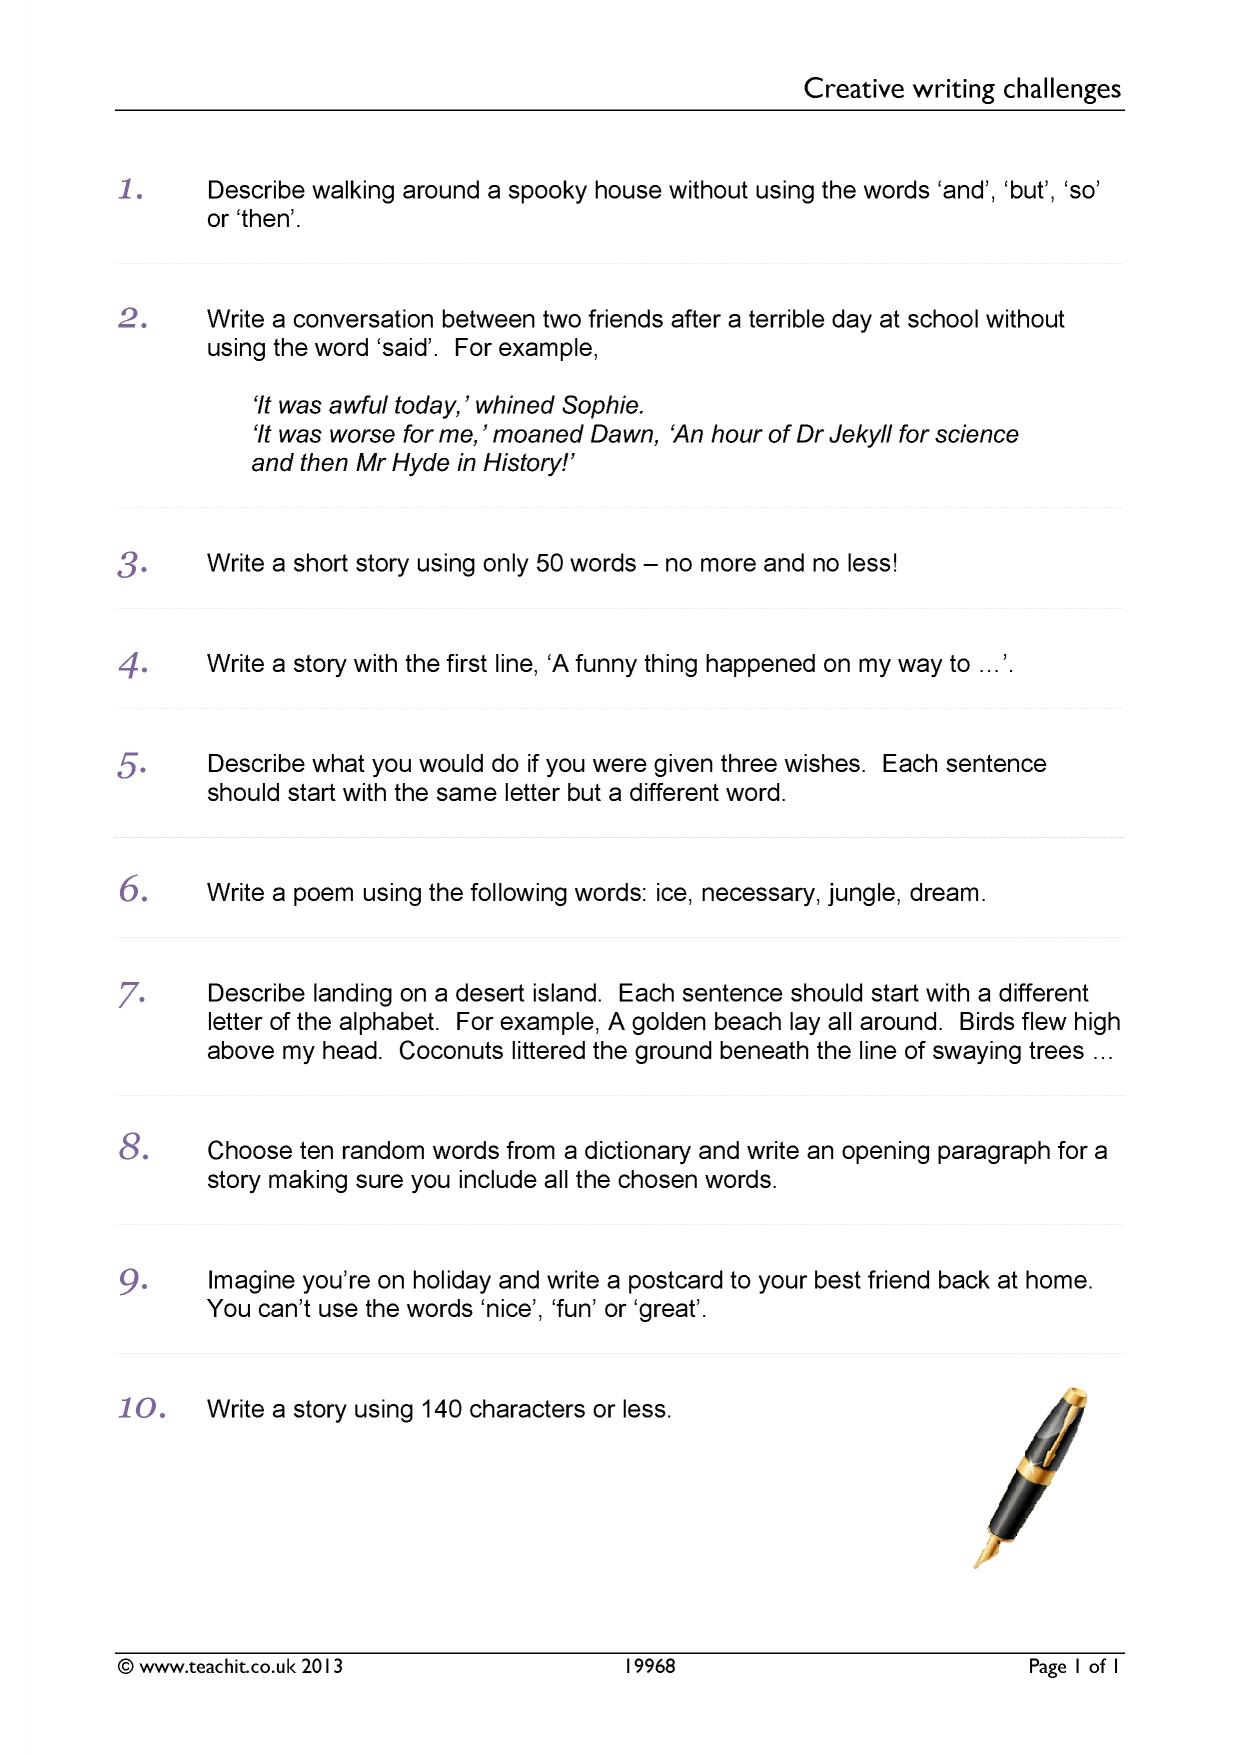 Creative Writing Homework Ks3